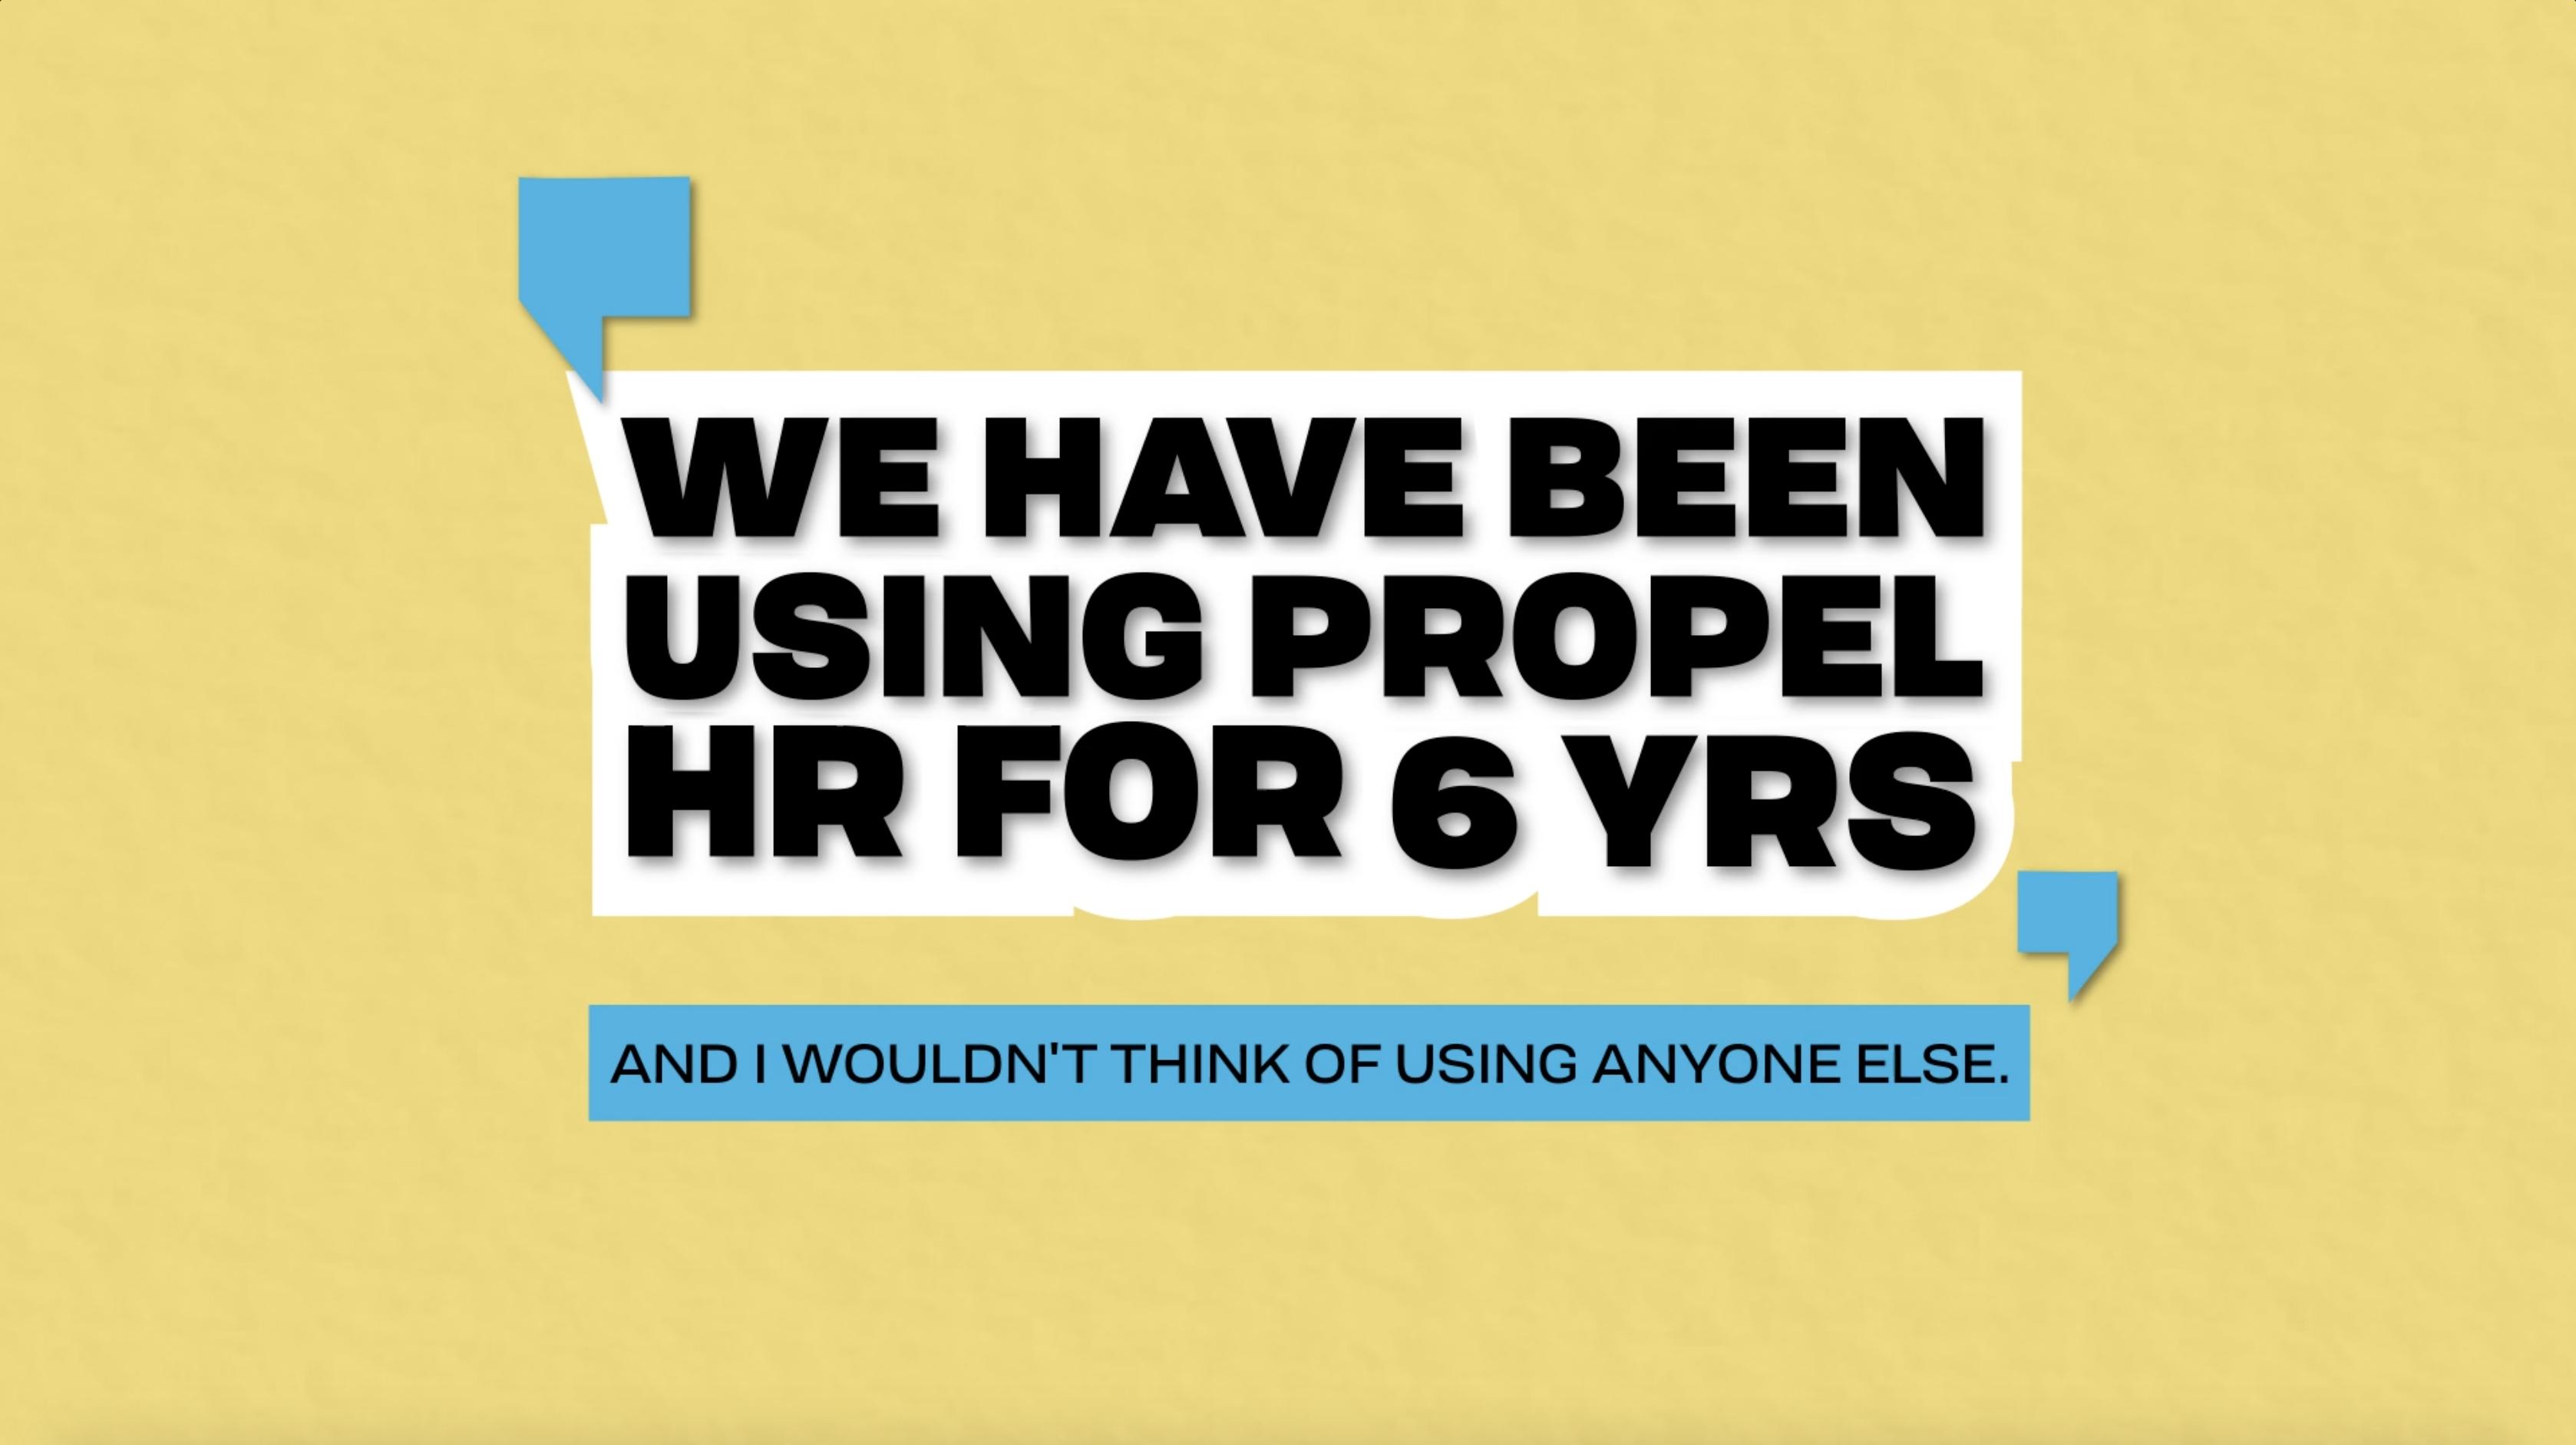 We have been using Propel HR